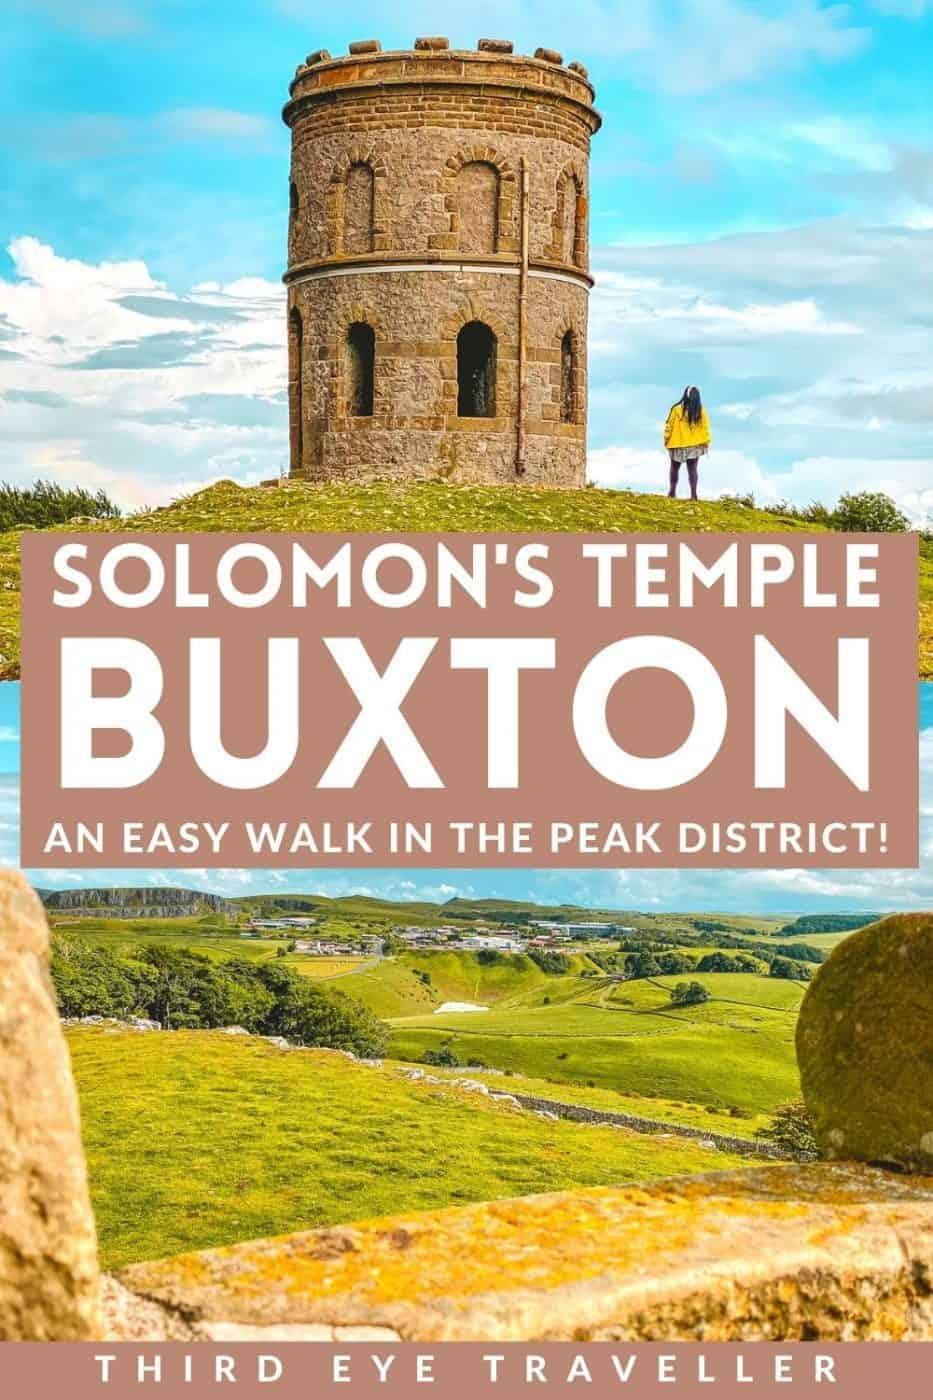 Solomons Temple Buxton Walk Peak District